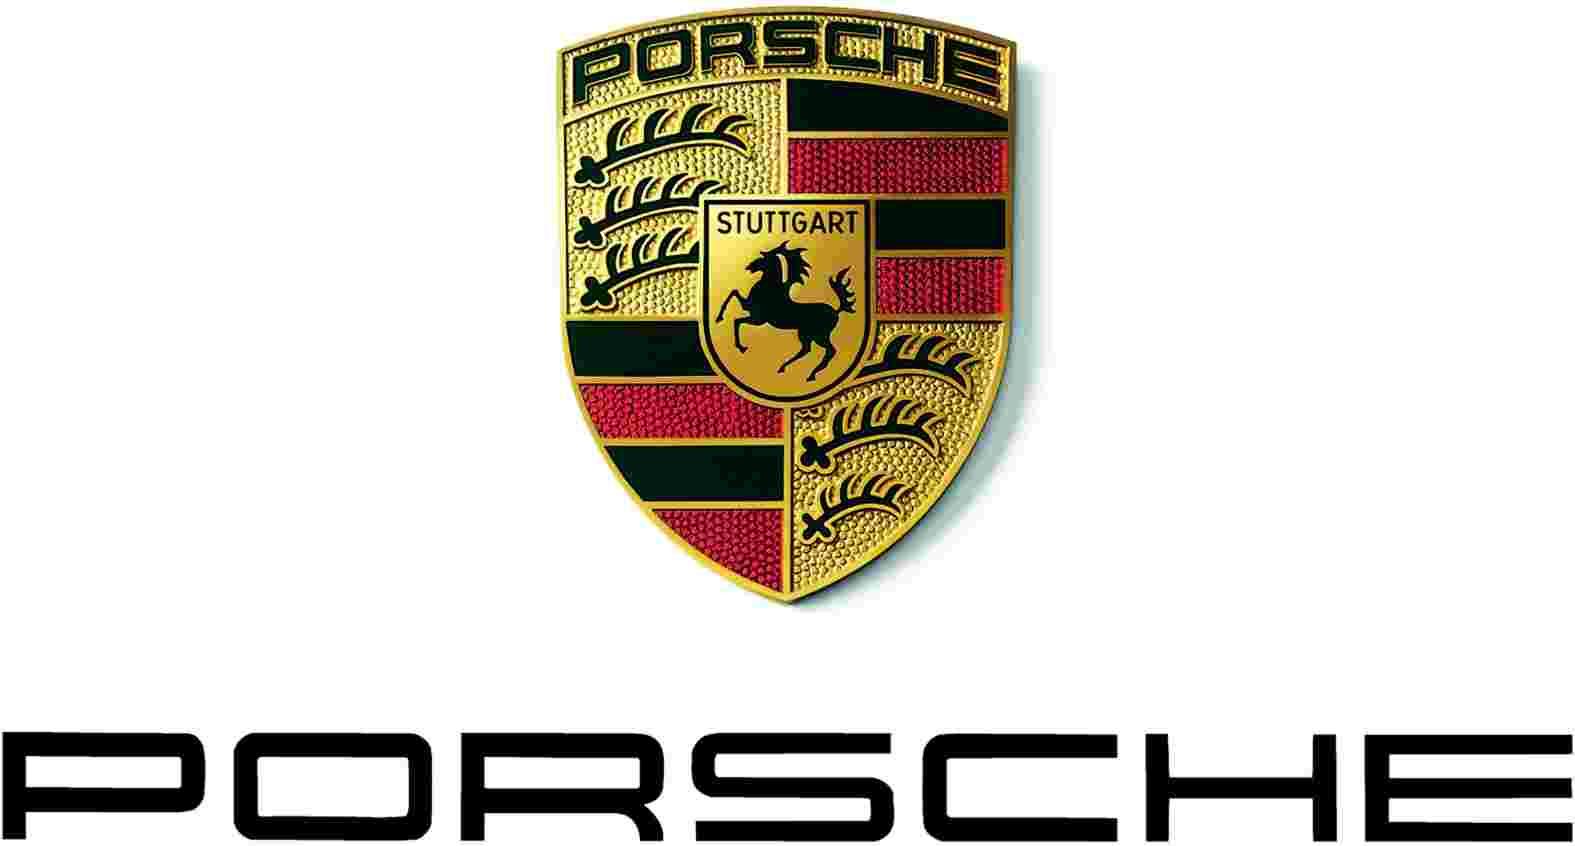 Porsche Symbol Wallpaper